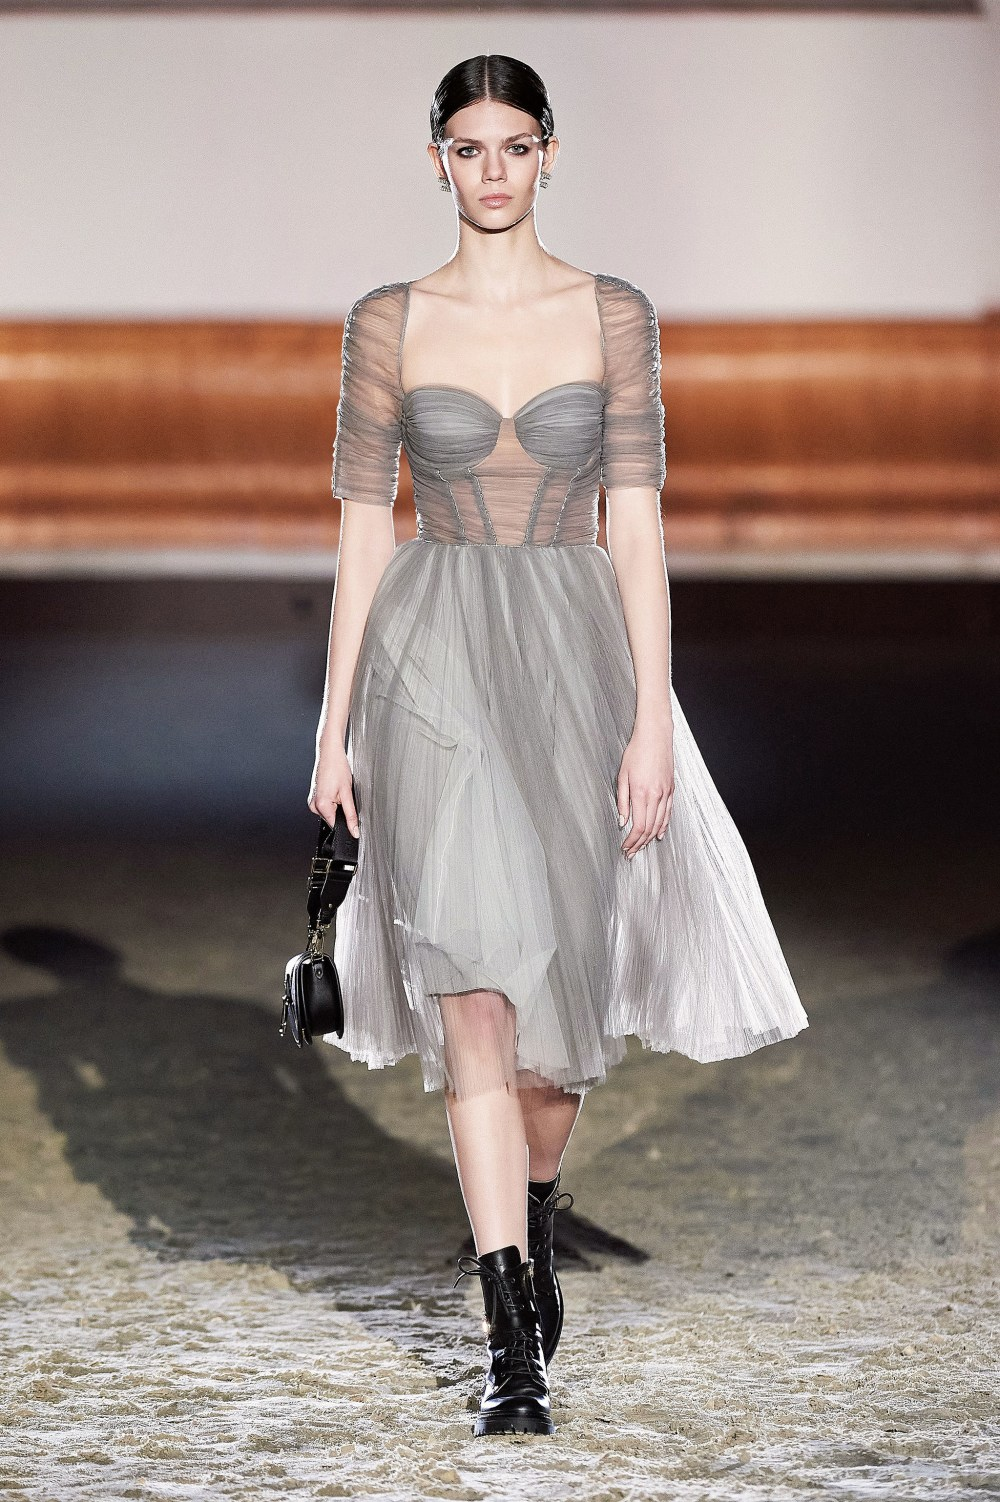 Elisabetta Franchi: Elisabetta Franchi Fall Winter 2021-22 Fashion Show Photo #23